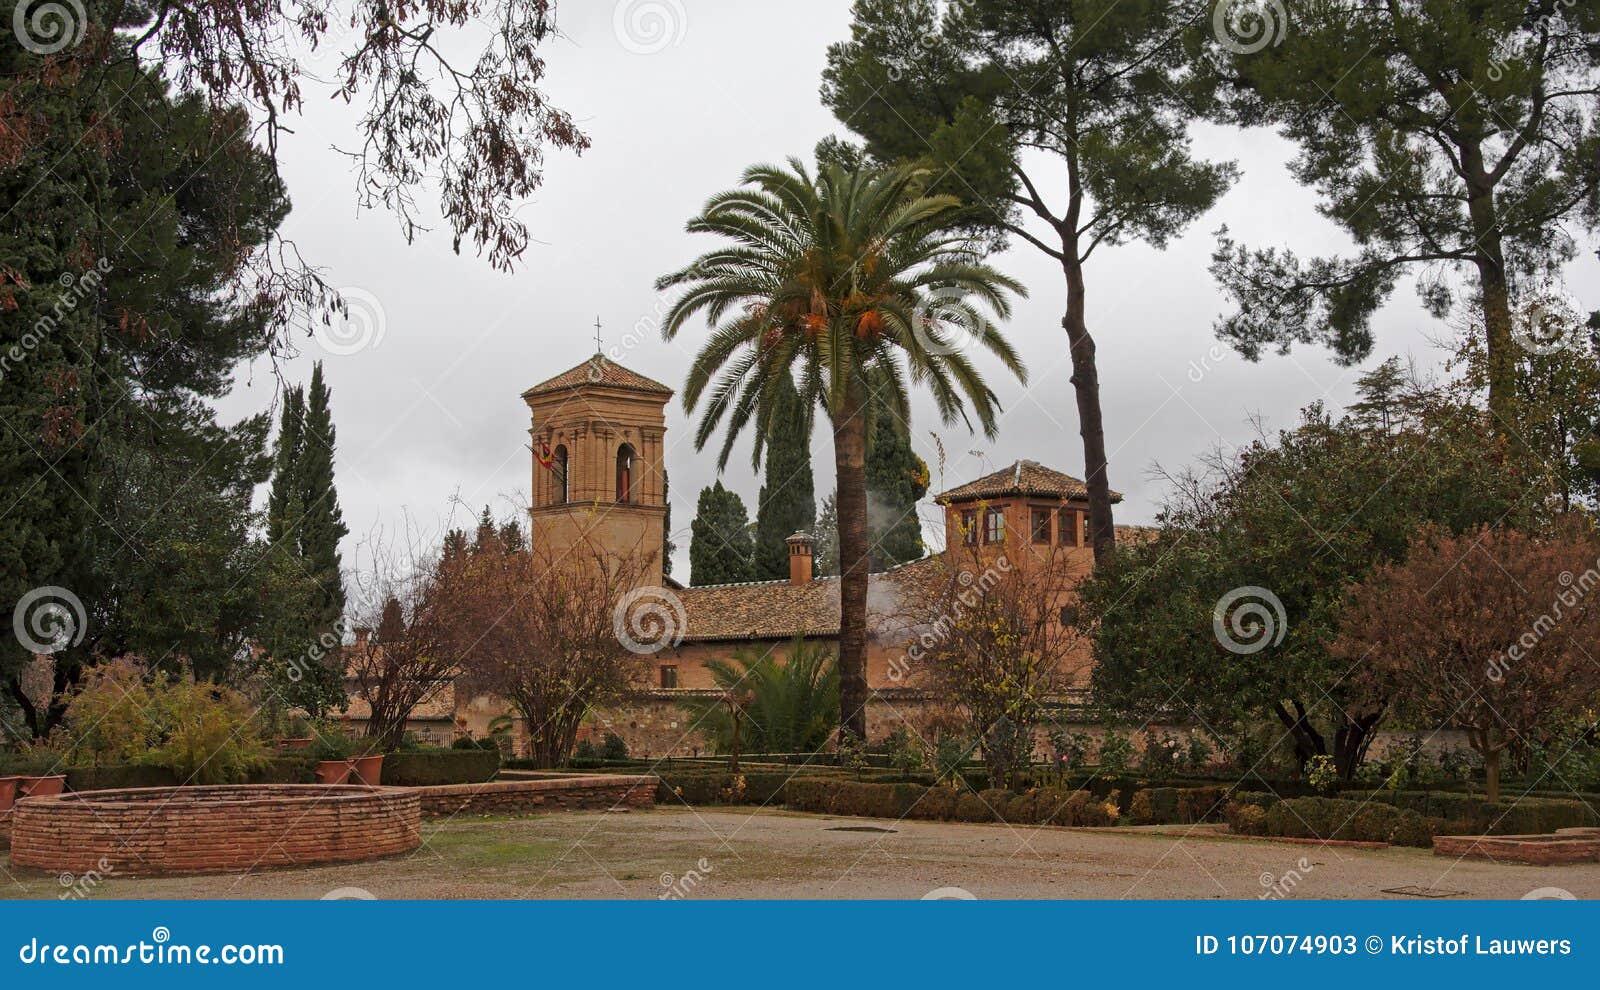 church of santa maria de alhambra in jardins del paraiso garden granada spain - Jardin De L Alhambra